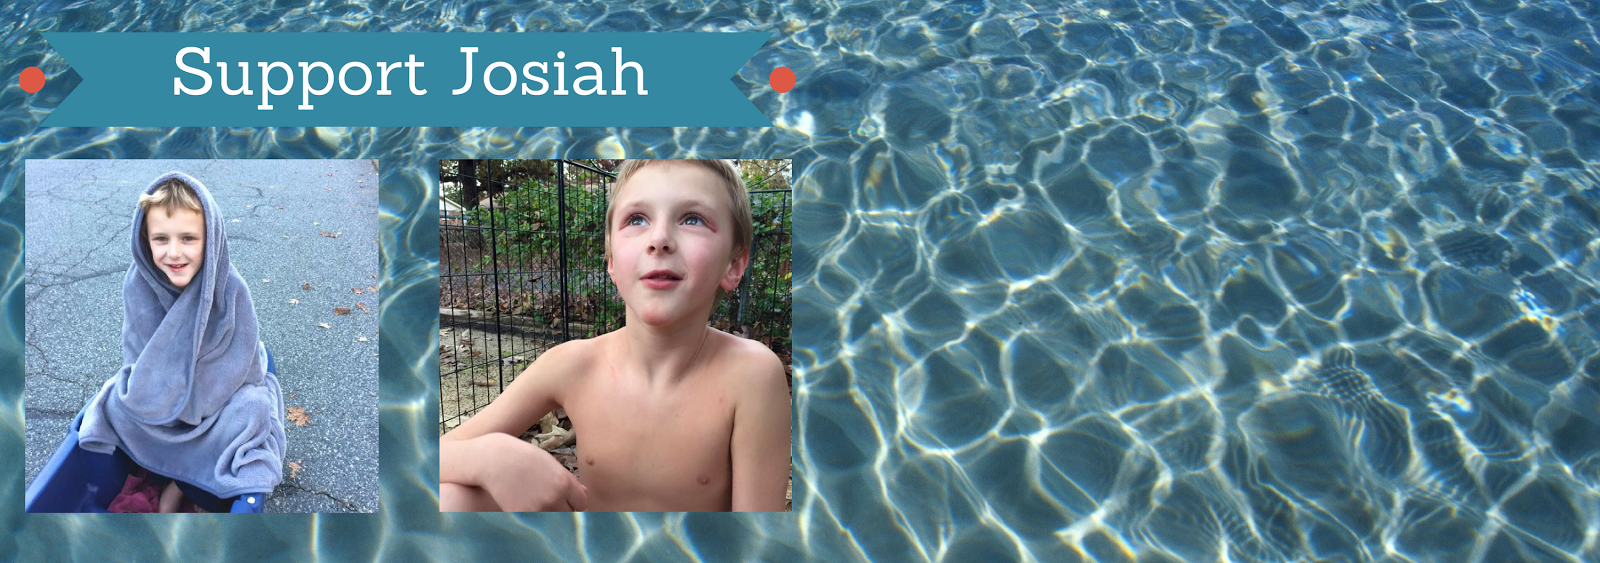 Support Josiah